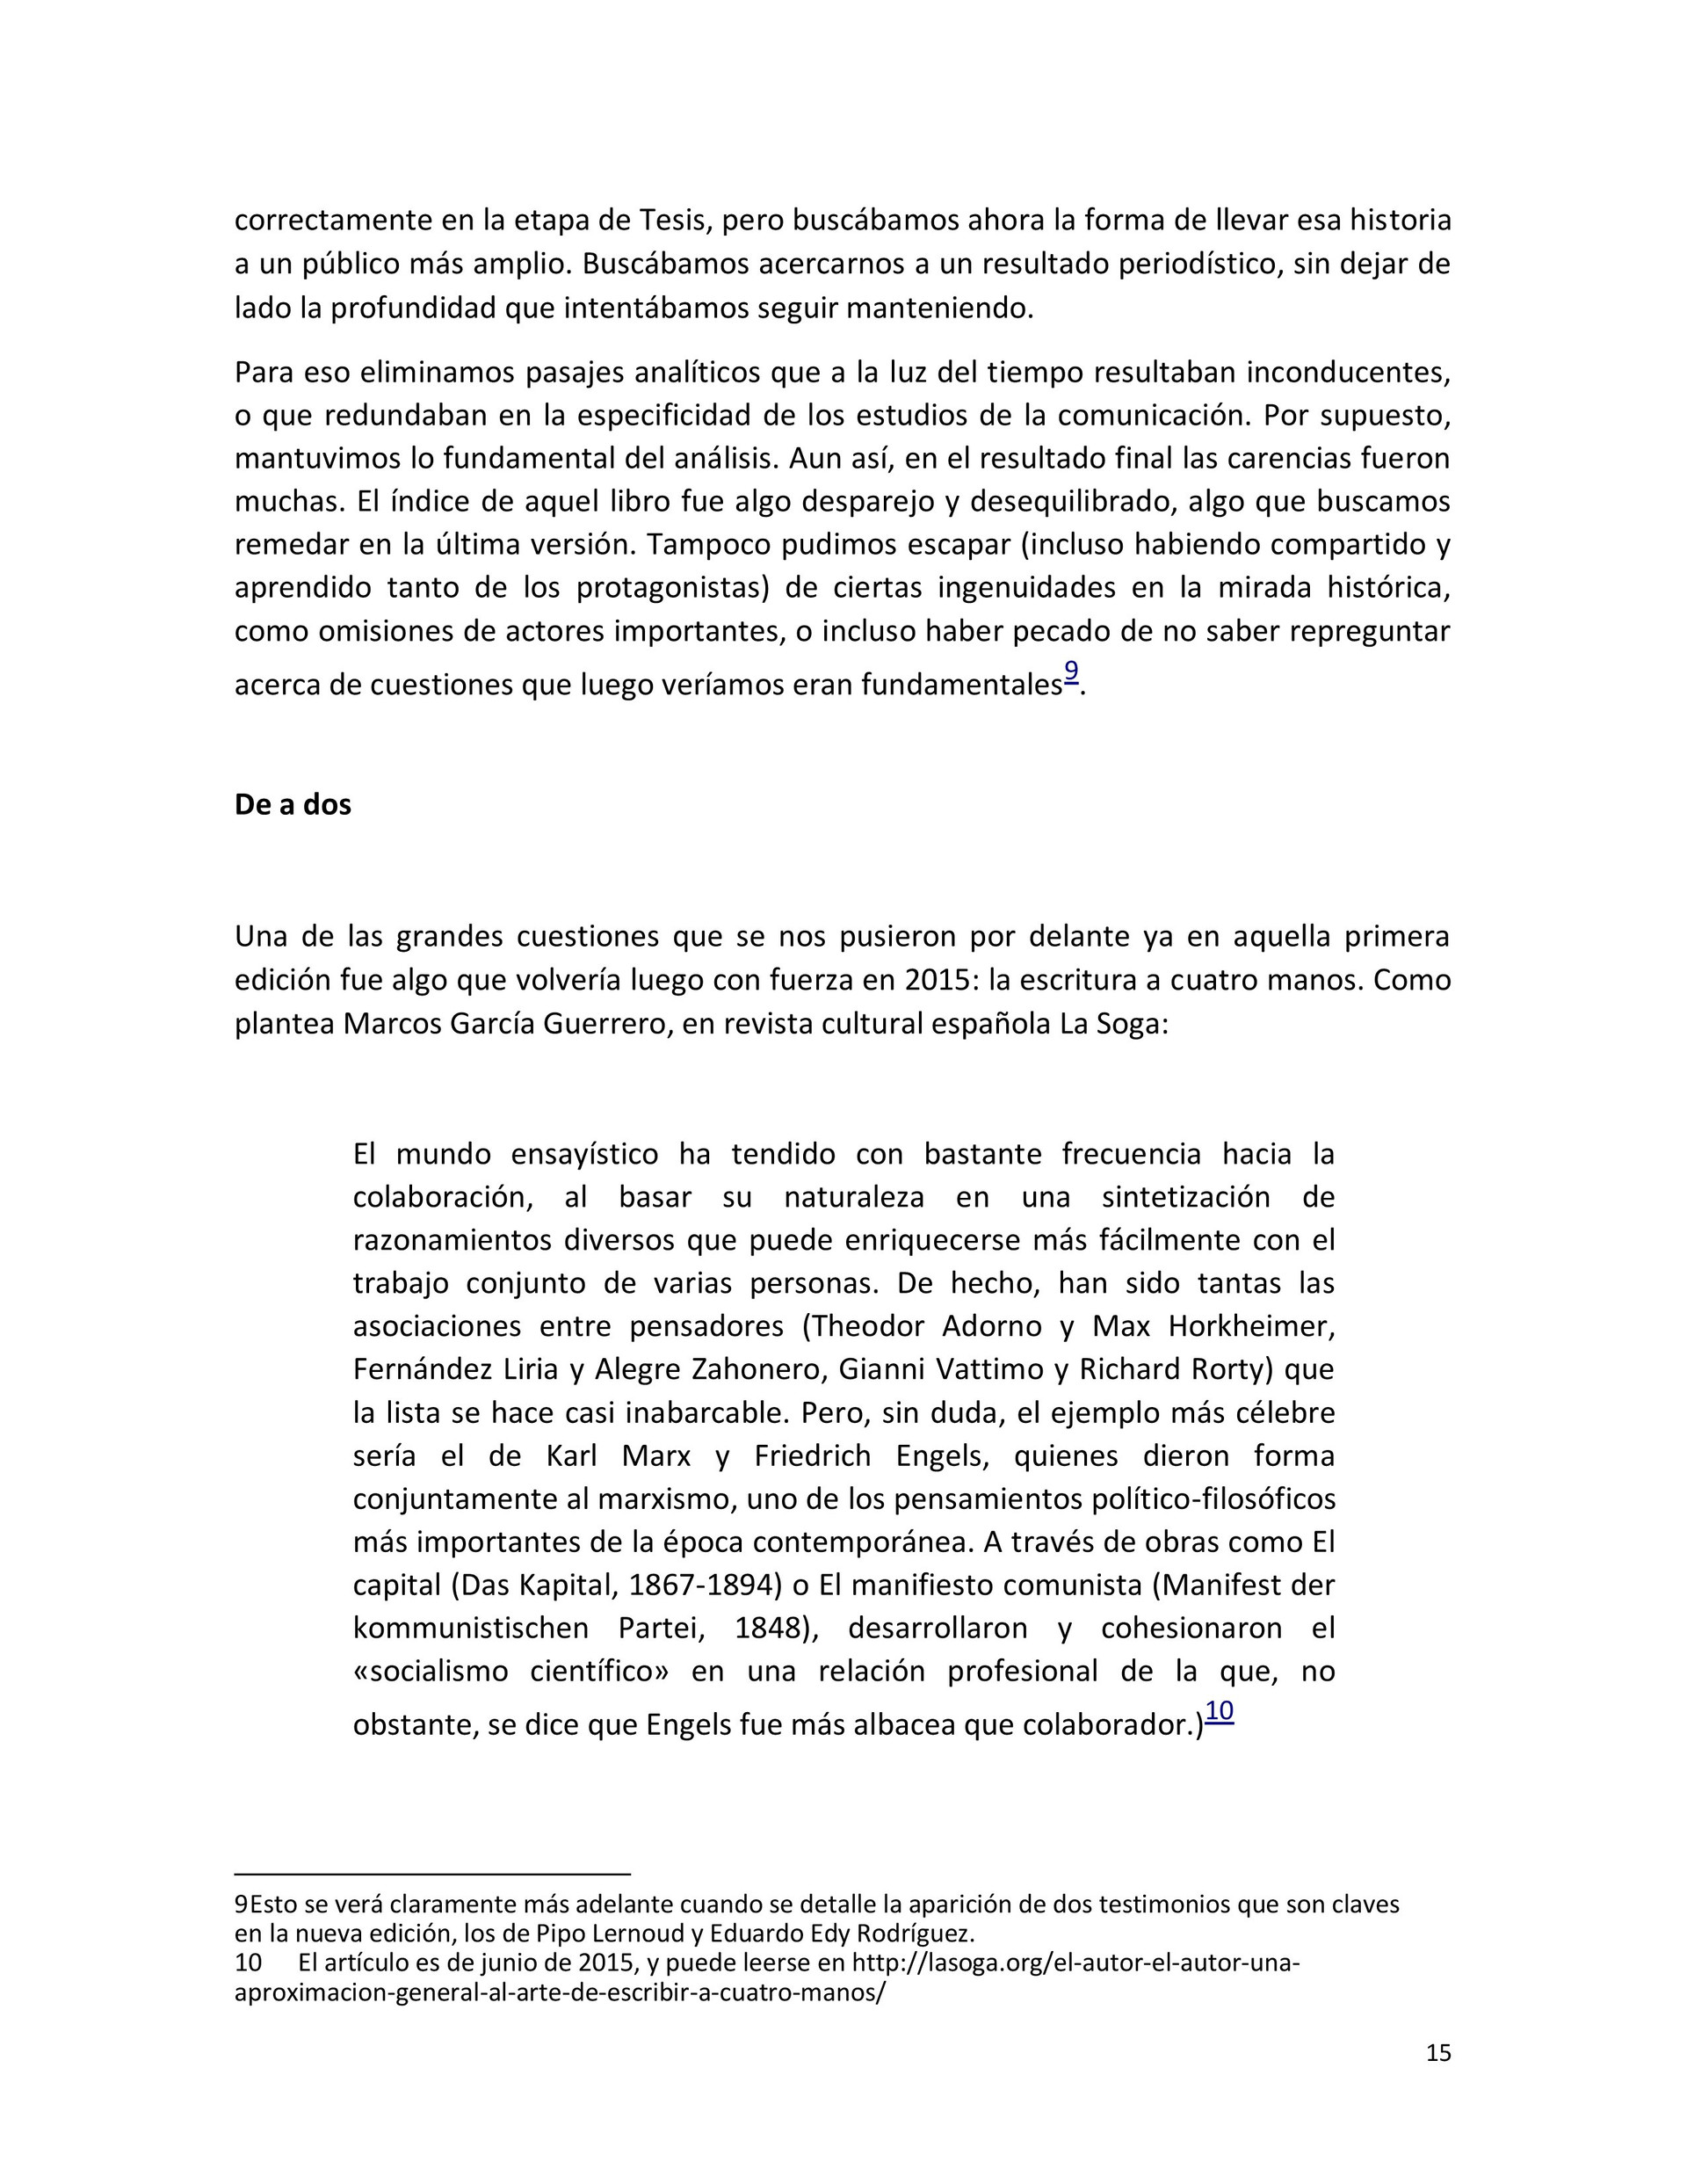 estacion_Page_14.jpeg